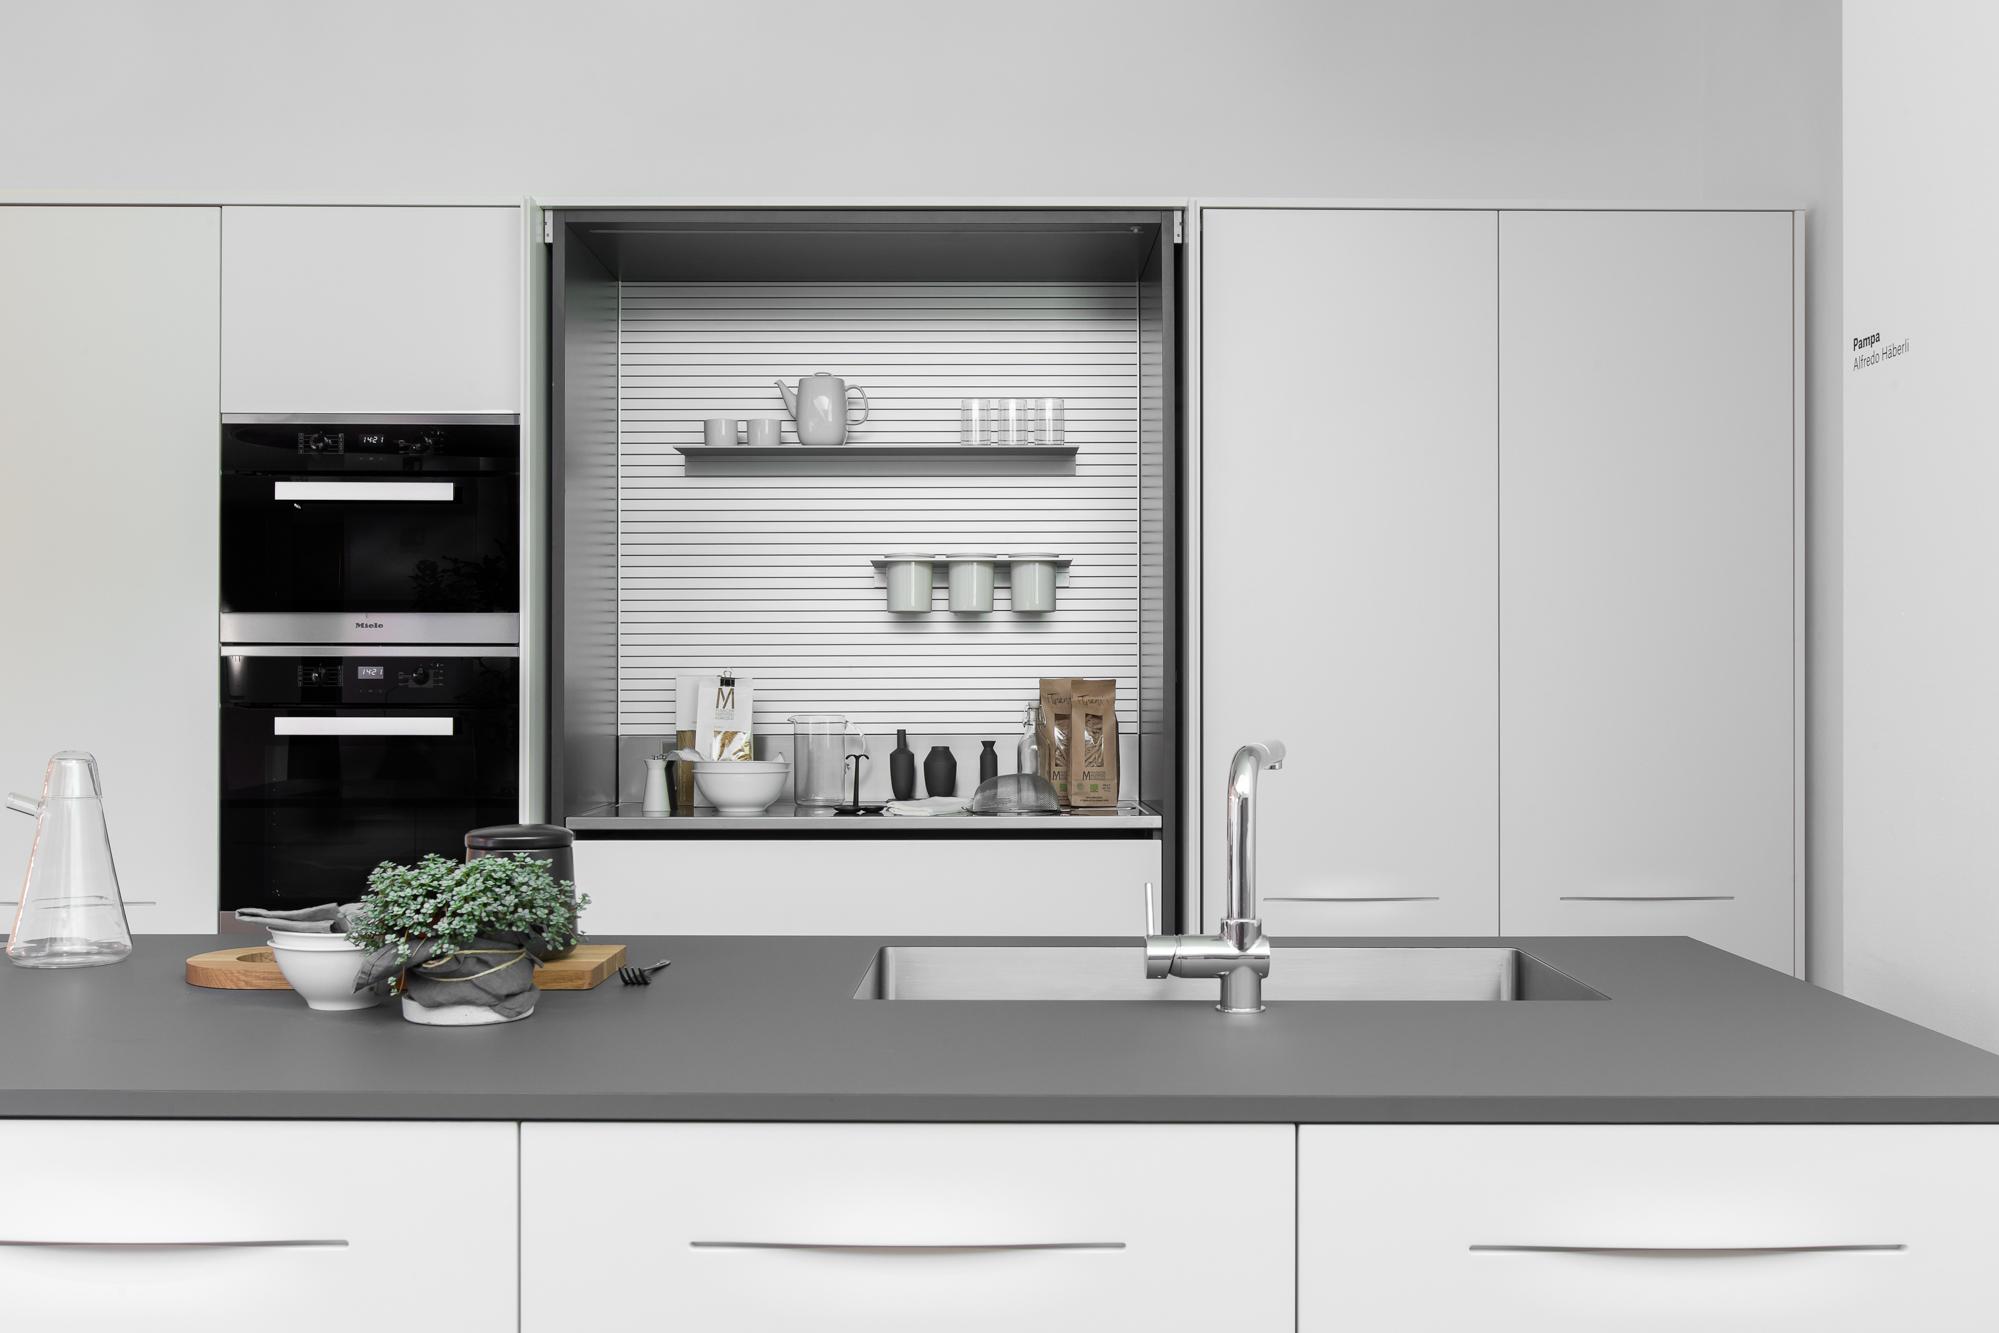 Stunning cucine schiffini catalogo ideas ideas design - Cucine sme prezzi ...